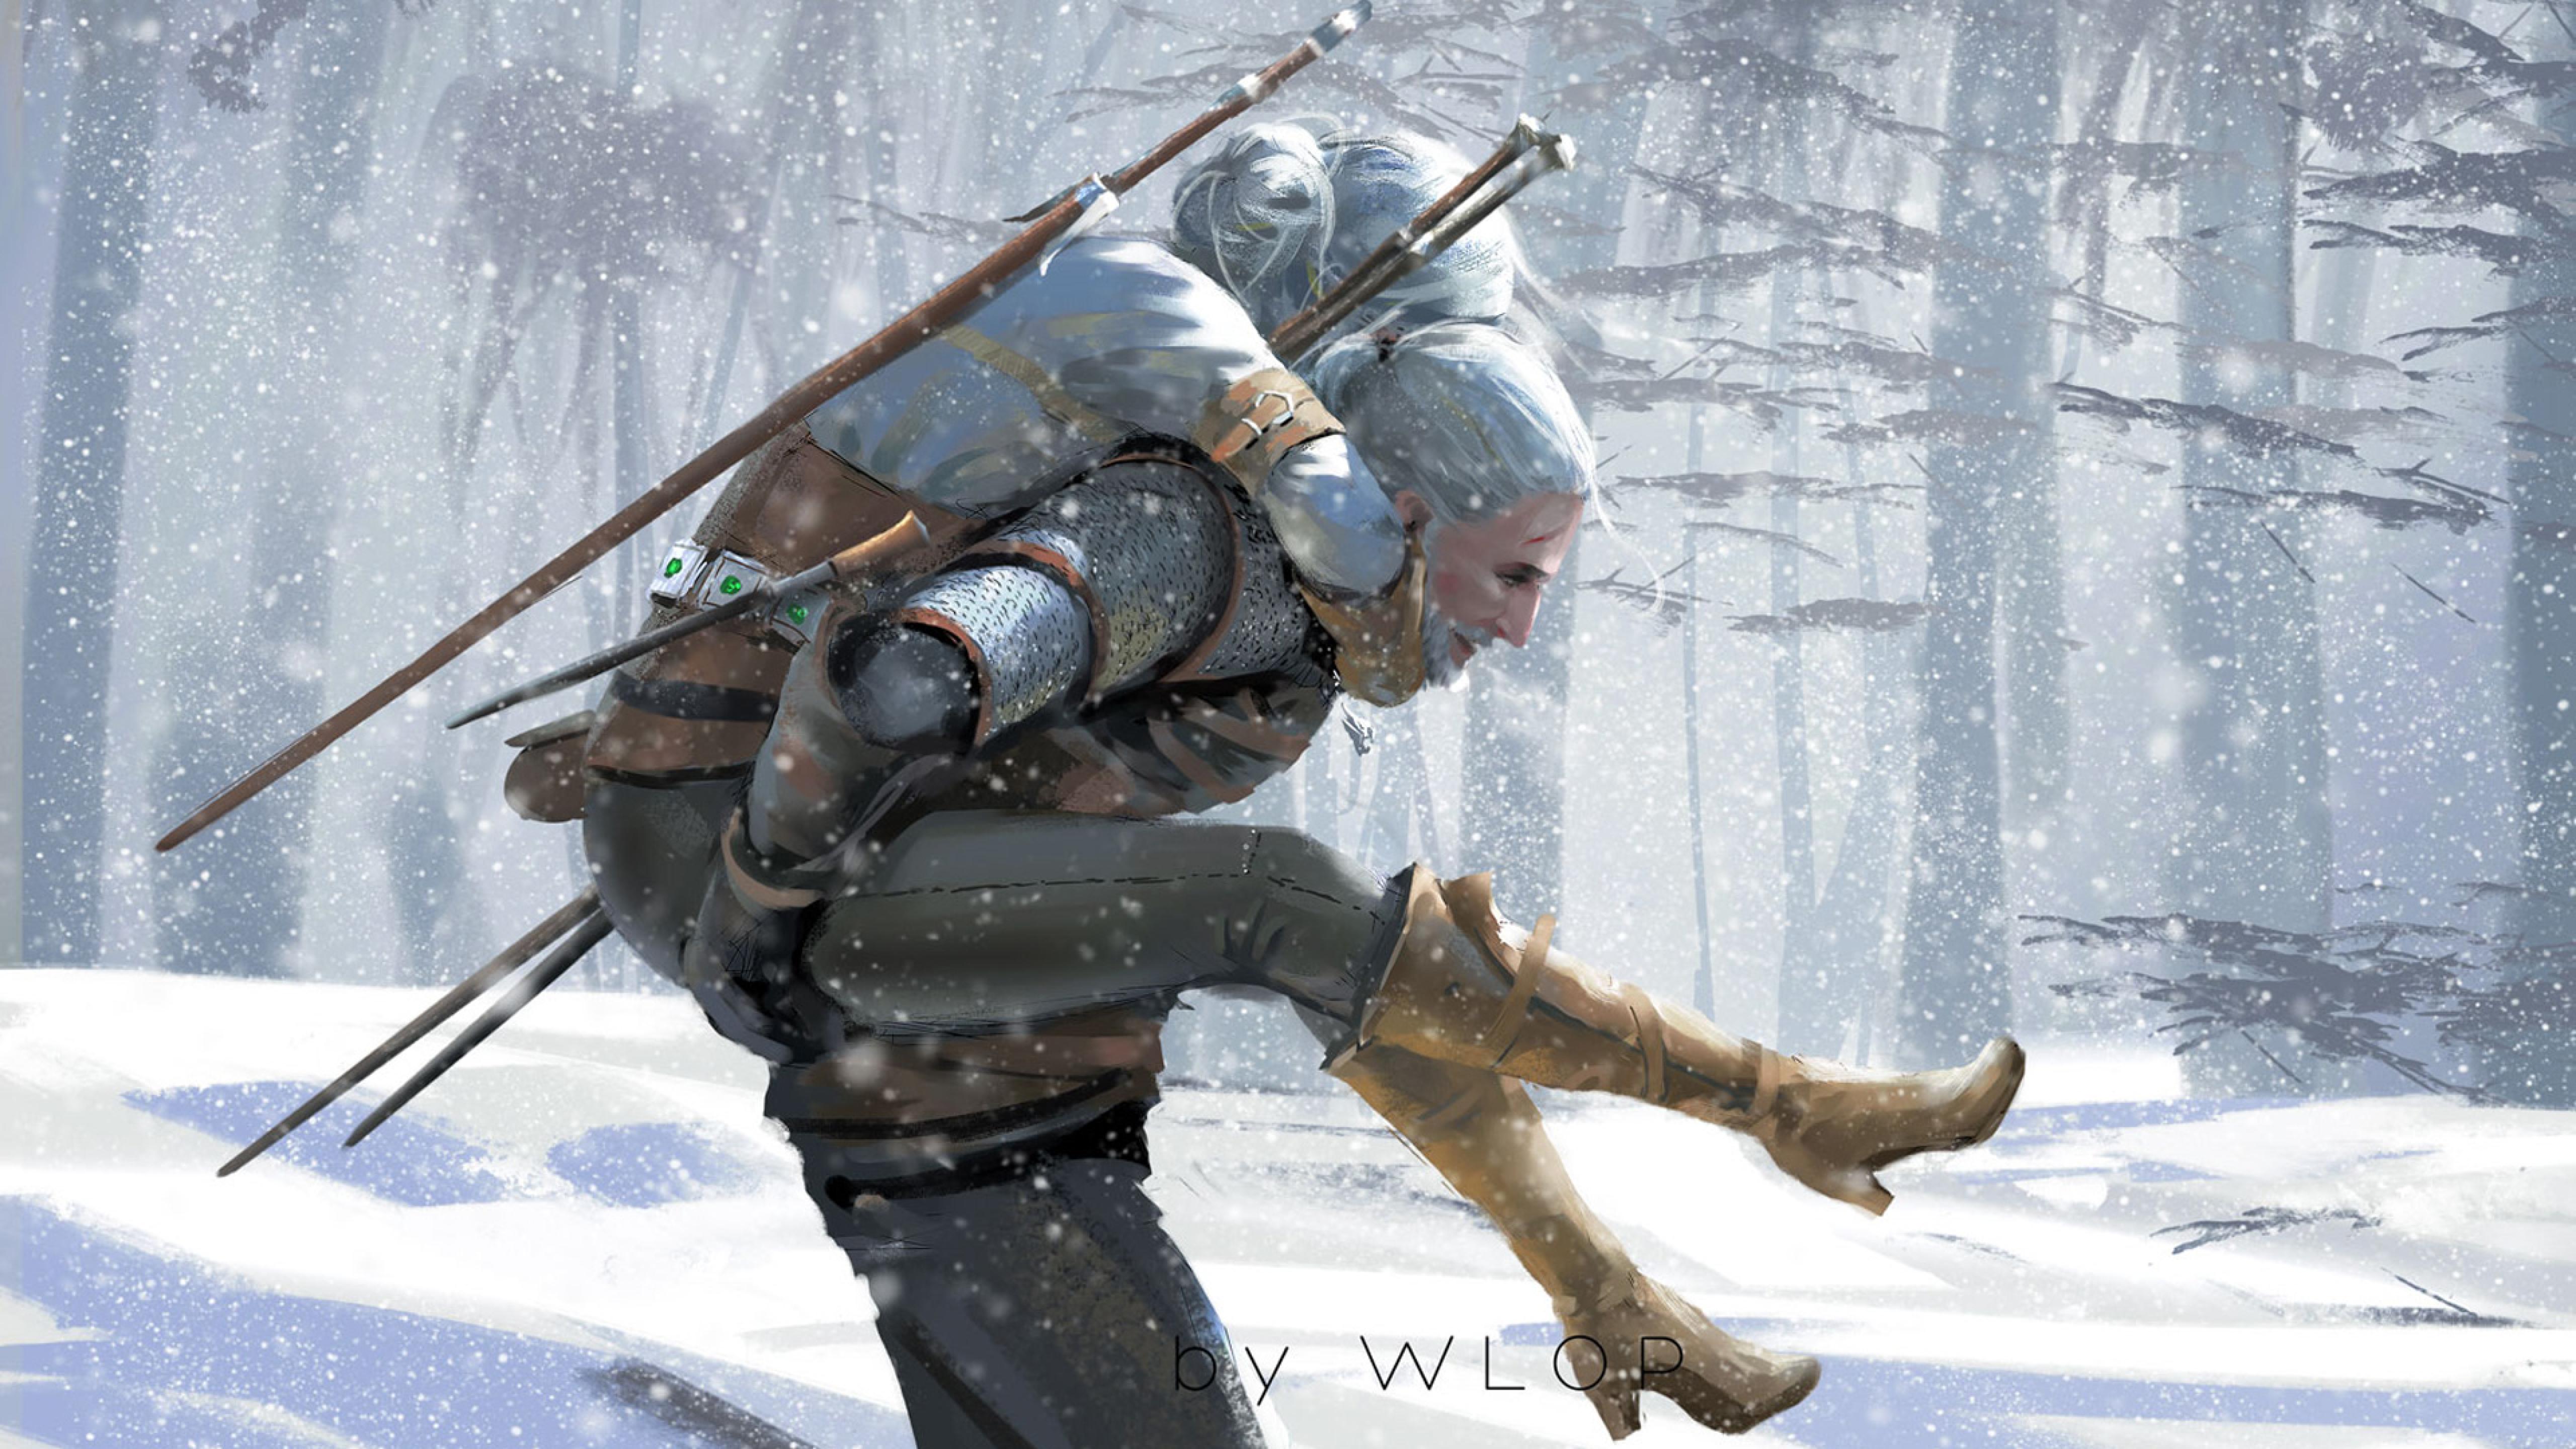 Witcher 3 Wallpaper Hd: The Witcher 3 Wild Hunt Artwork, Full HD Wallpaper